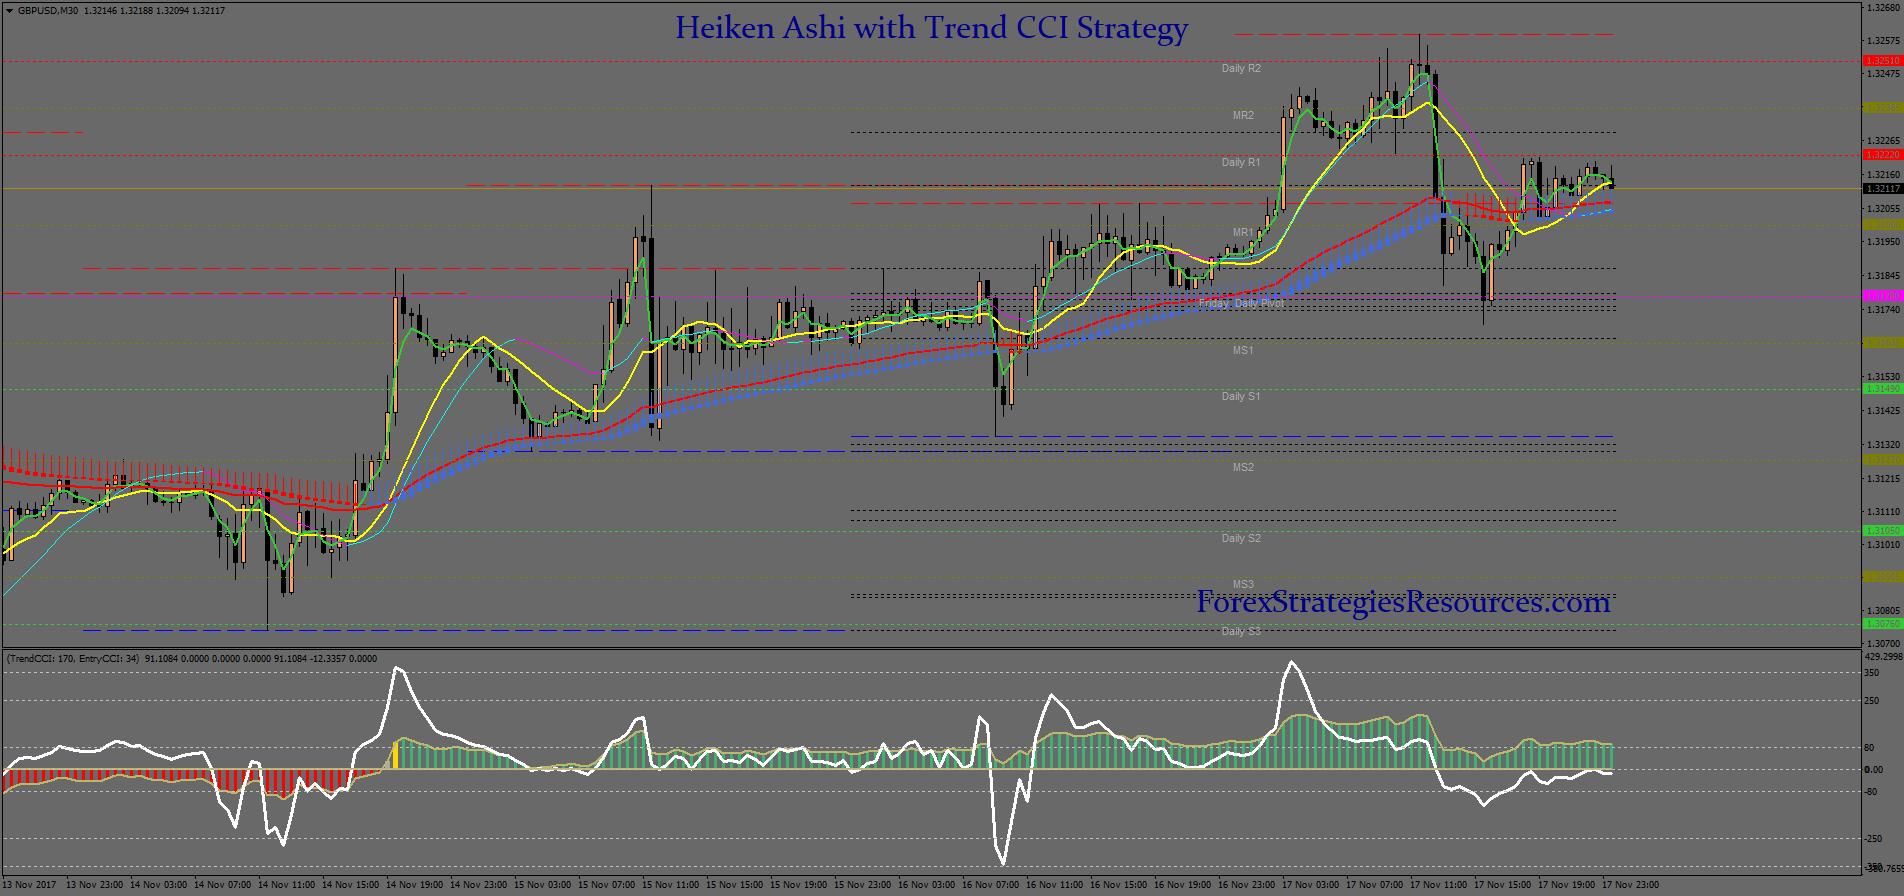 Heiken Ashi with Trend CCI Strategy - Forex Strategies